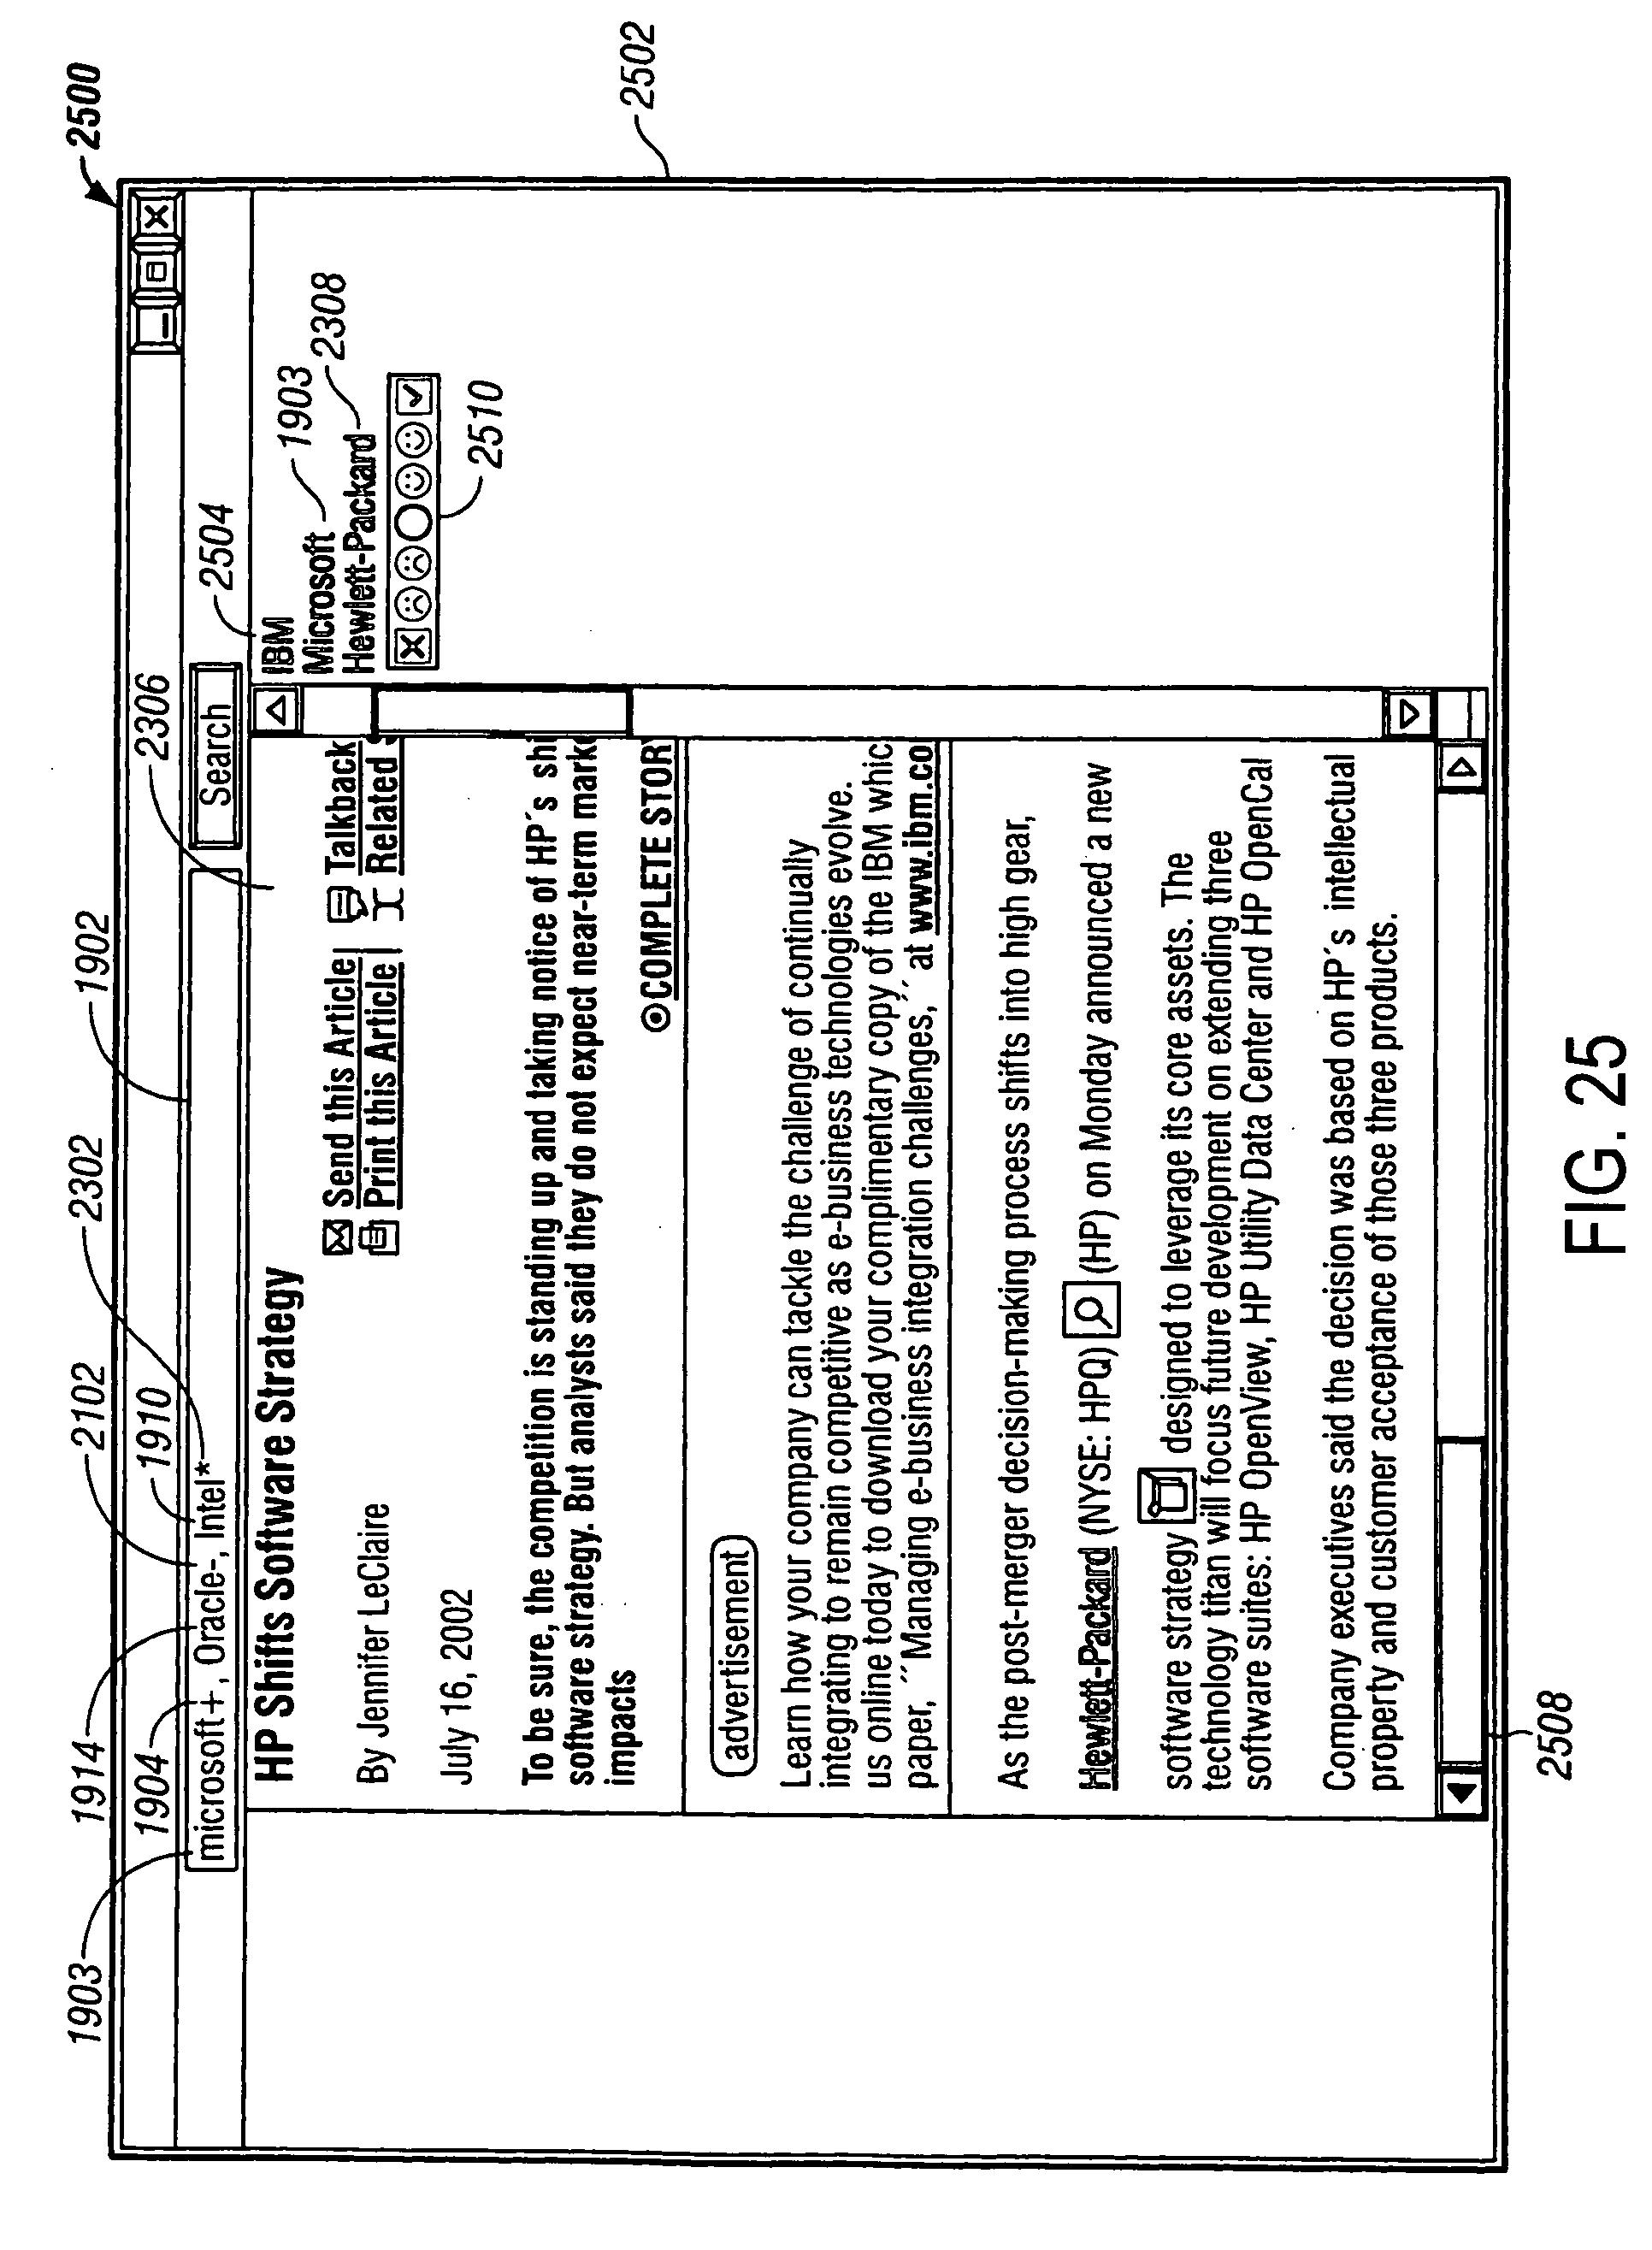 Patent US 7,305,436 B2